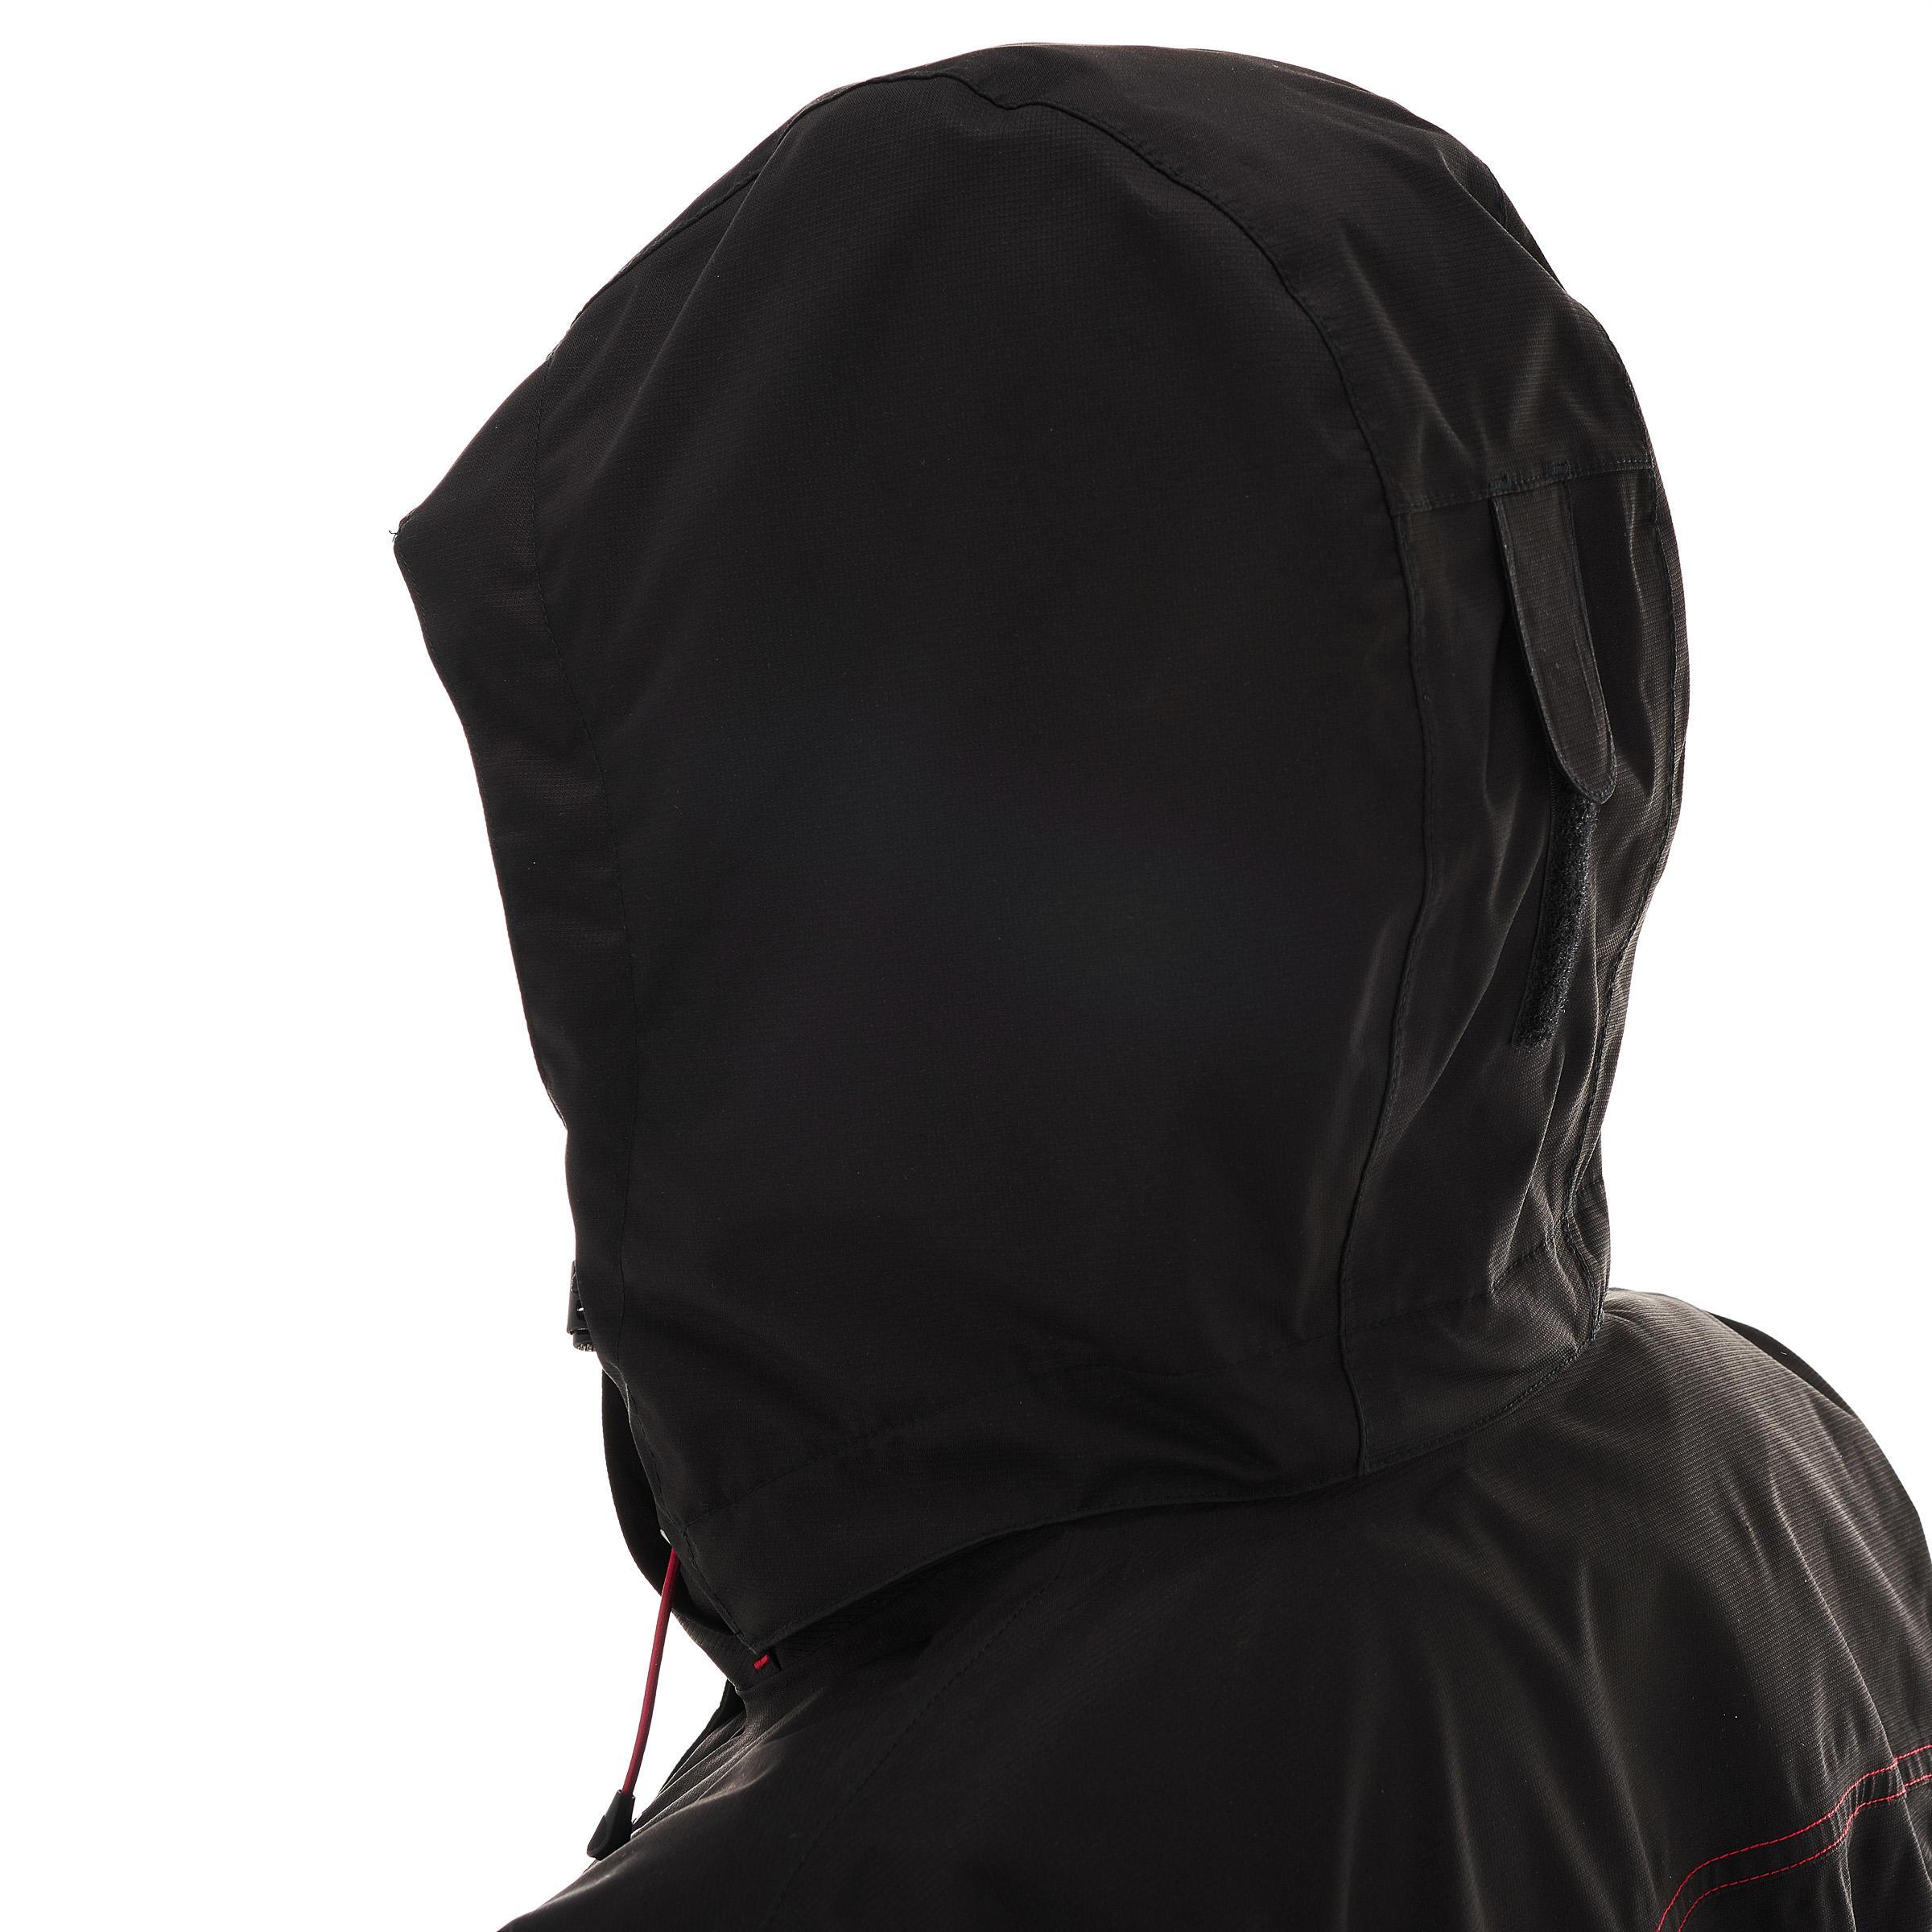 Rainwarm 100 Women's 3-in-1 Trekking Jacket - Black